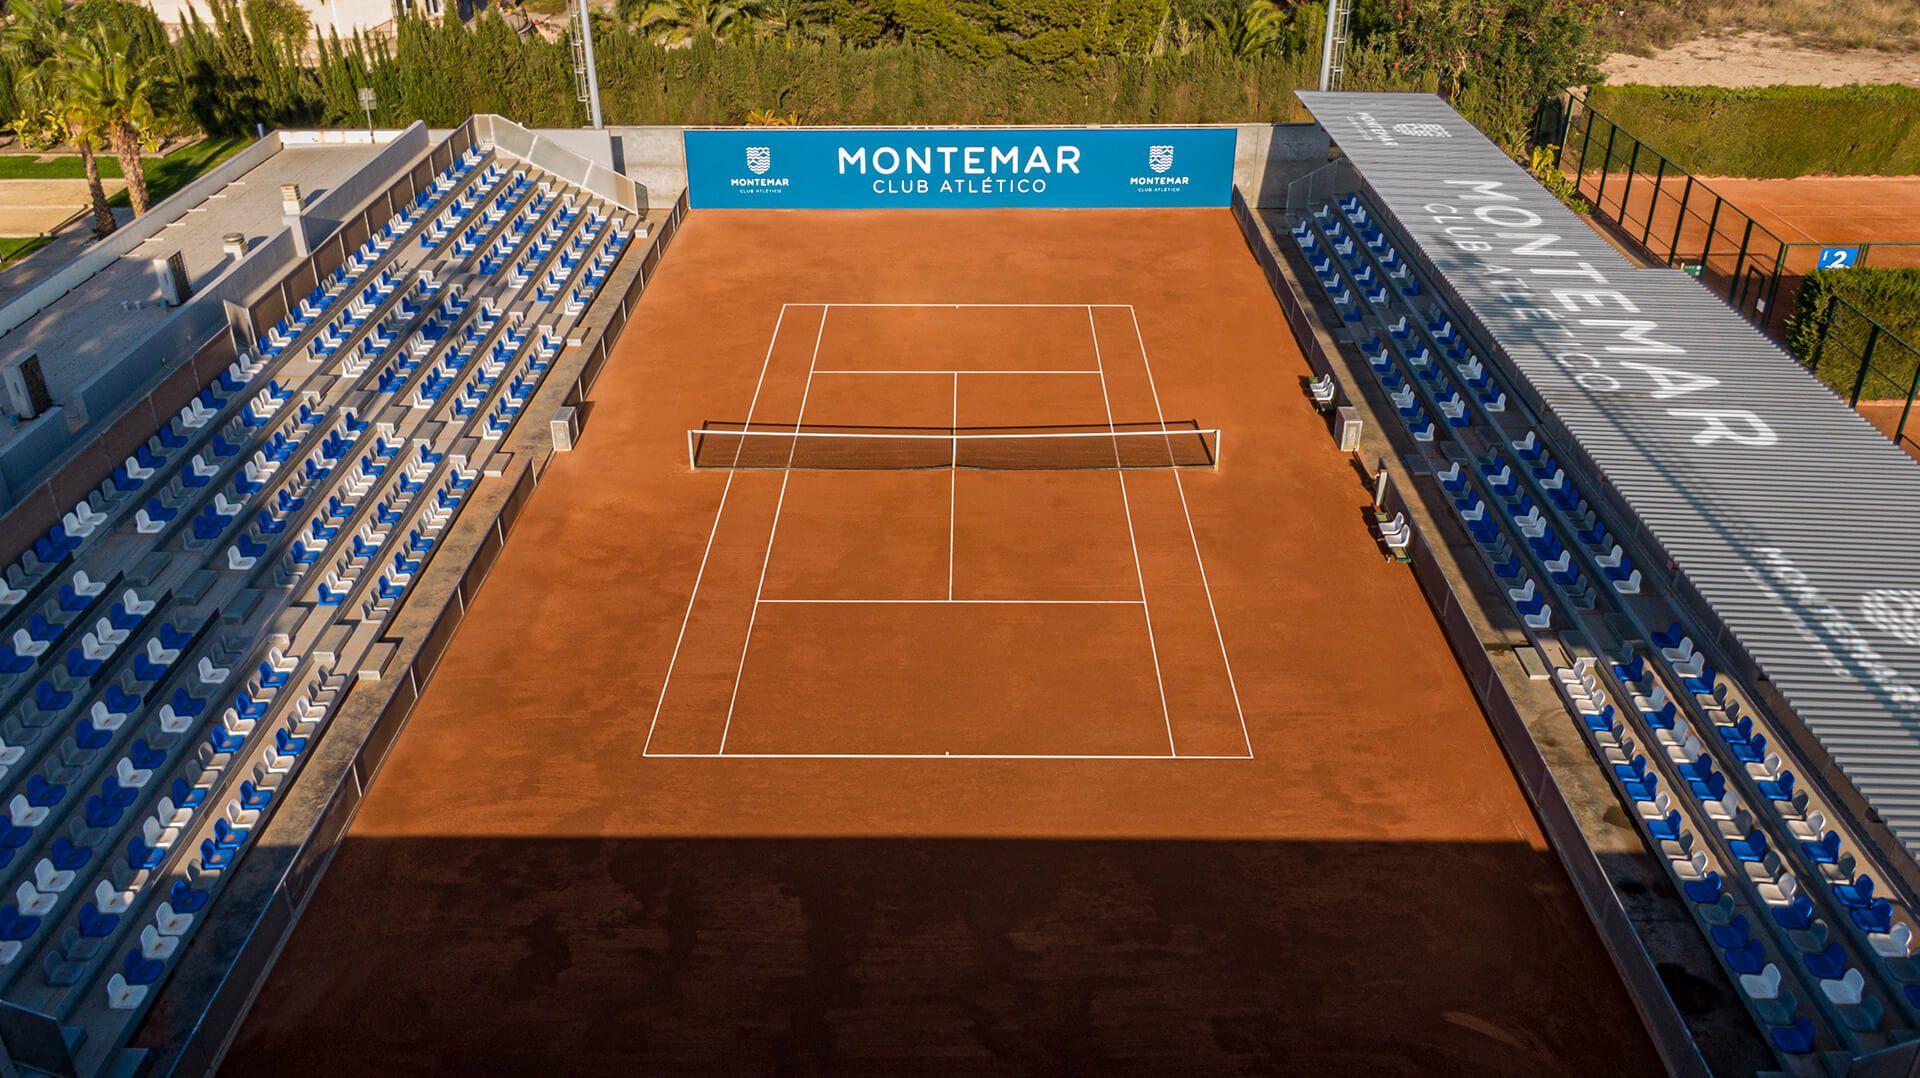 Pista principal de Tenis CA Montemar